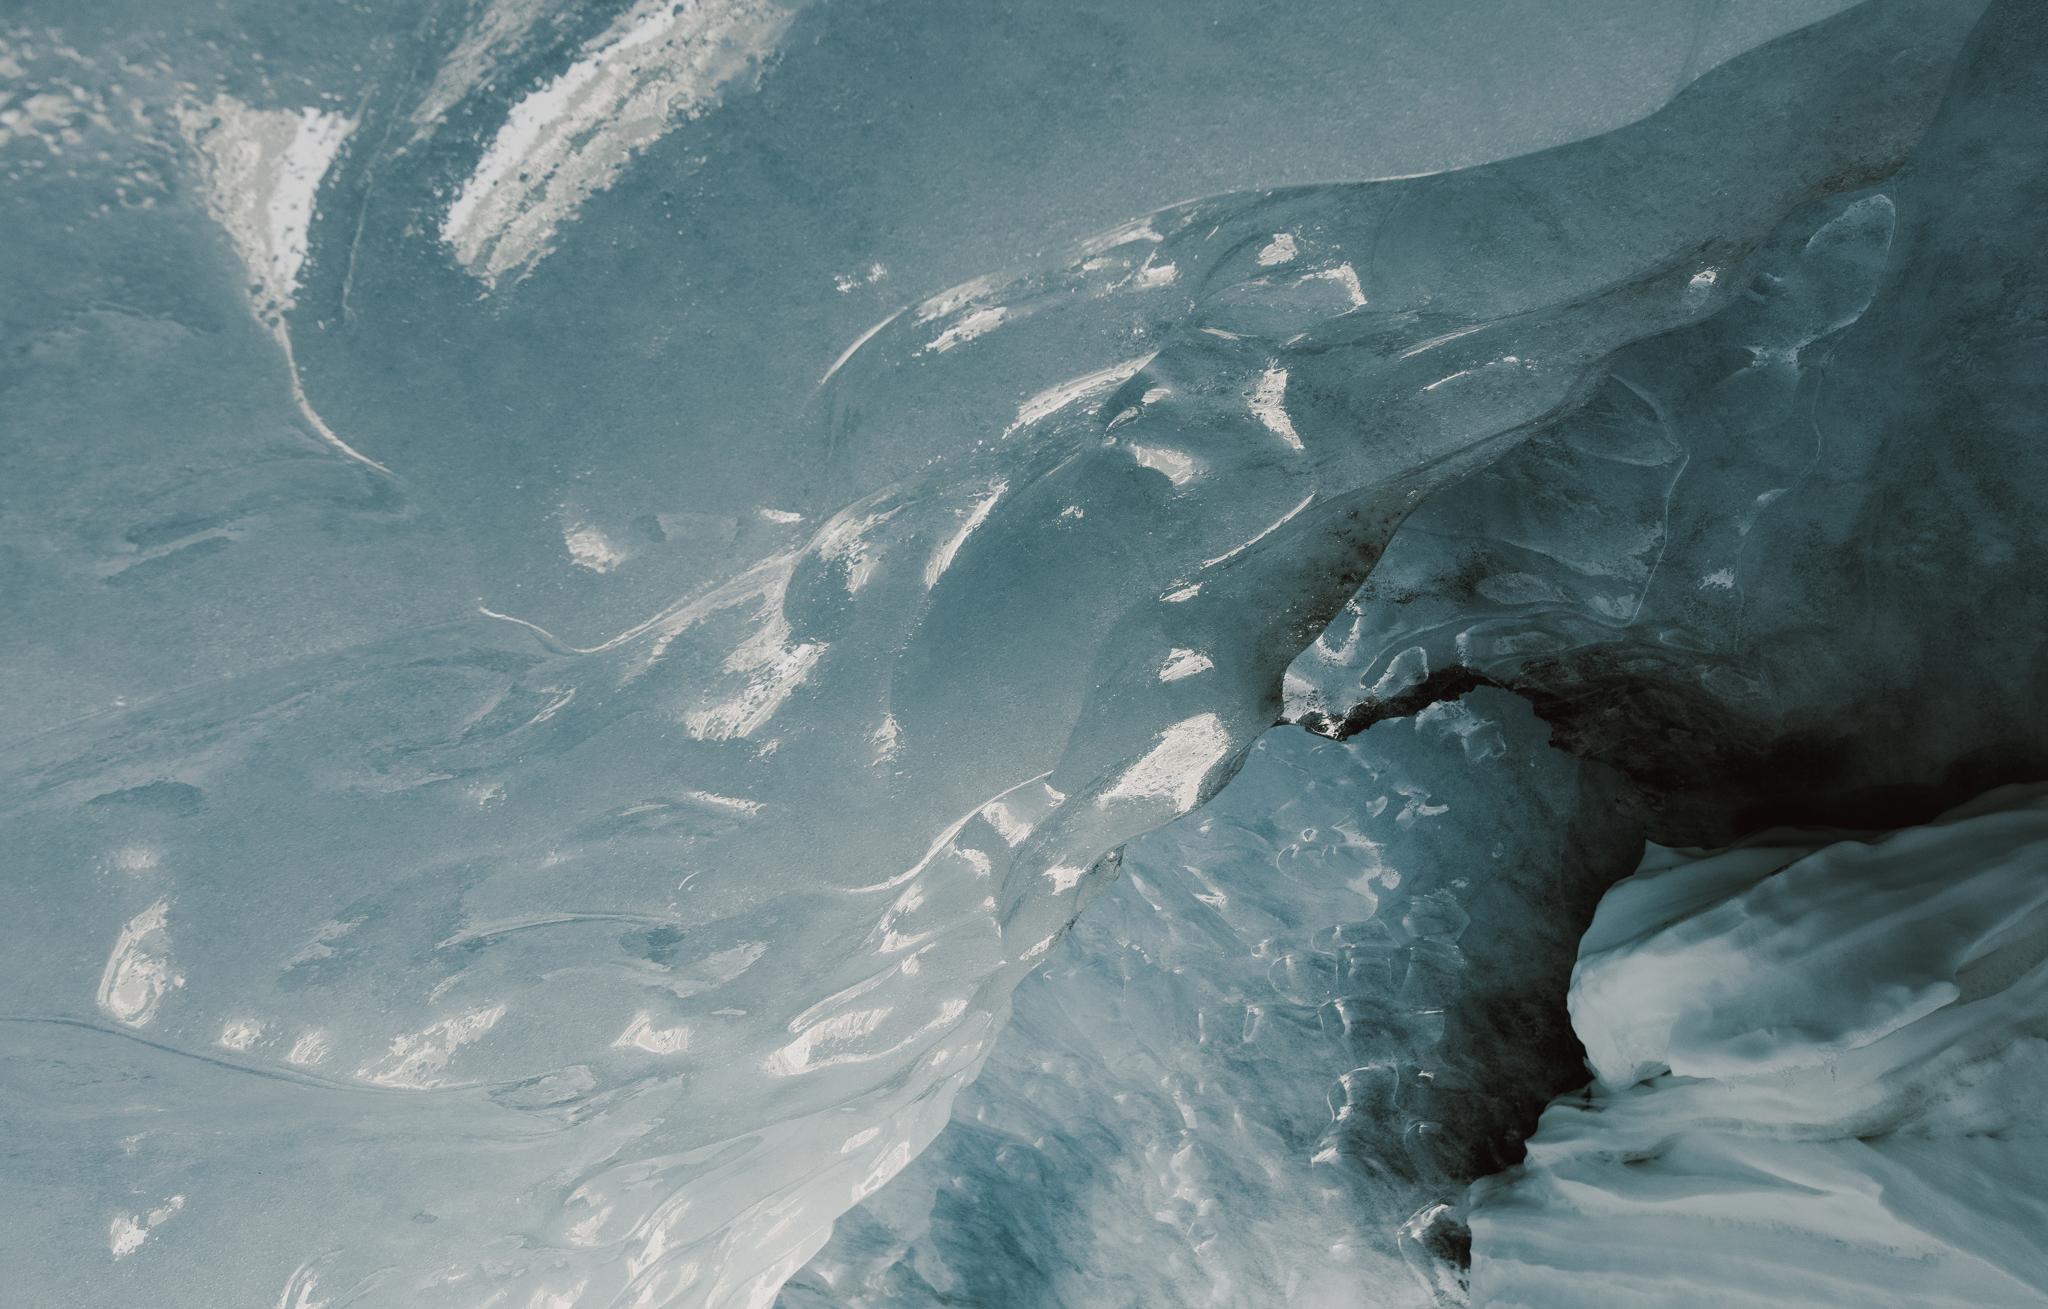 ©The-Ryans-Photo---Athabasca-Glacier,-Ice-Cave-034.jpg